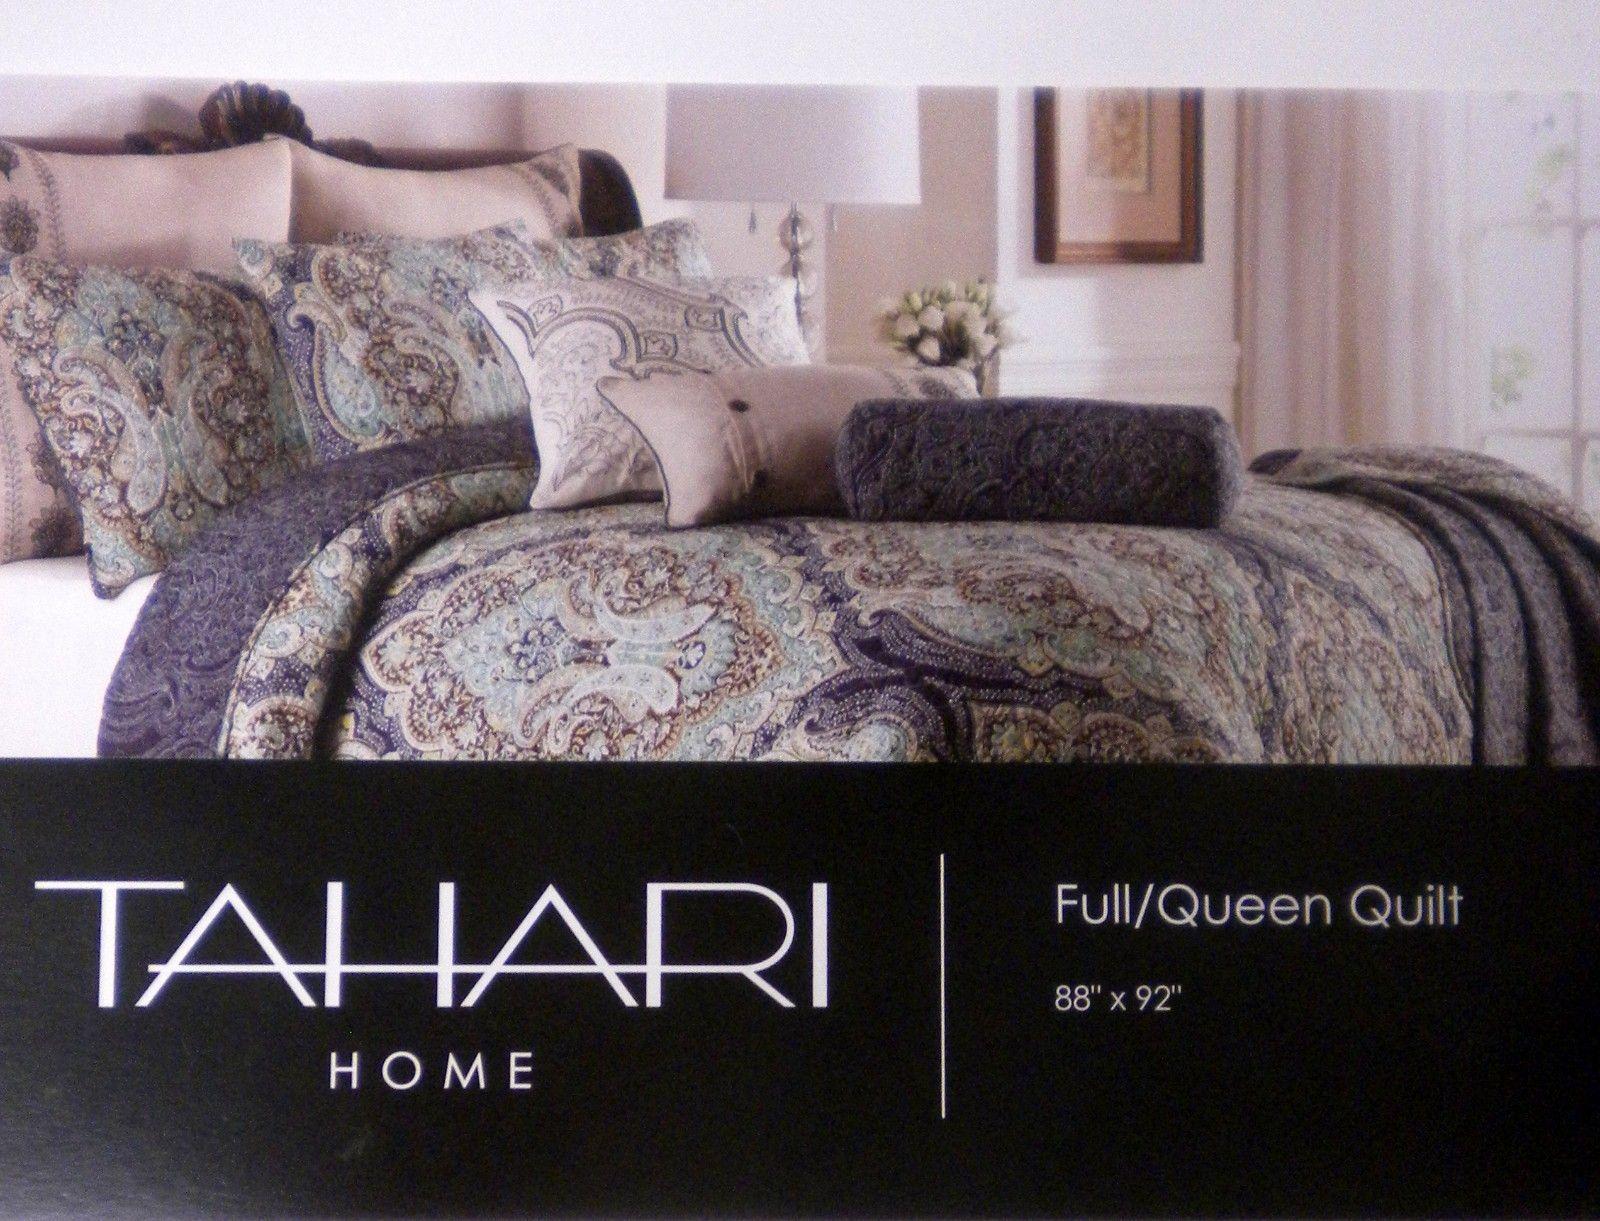 tahari rich medallion 3pc full queen quilt & sham set new navy